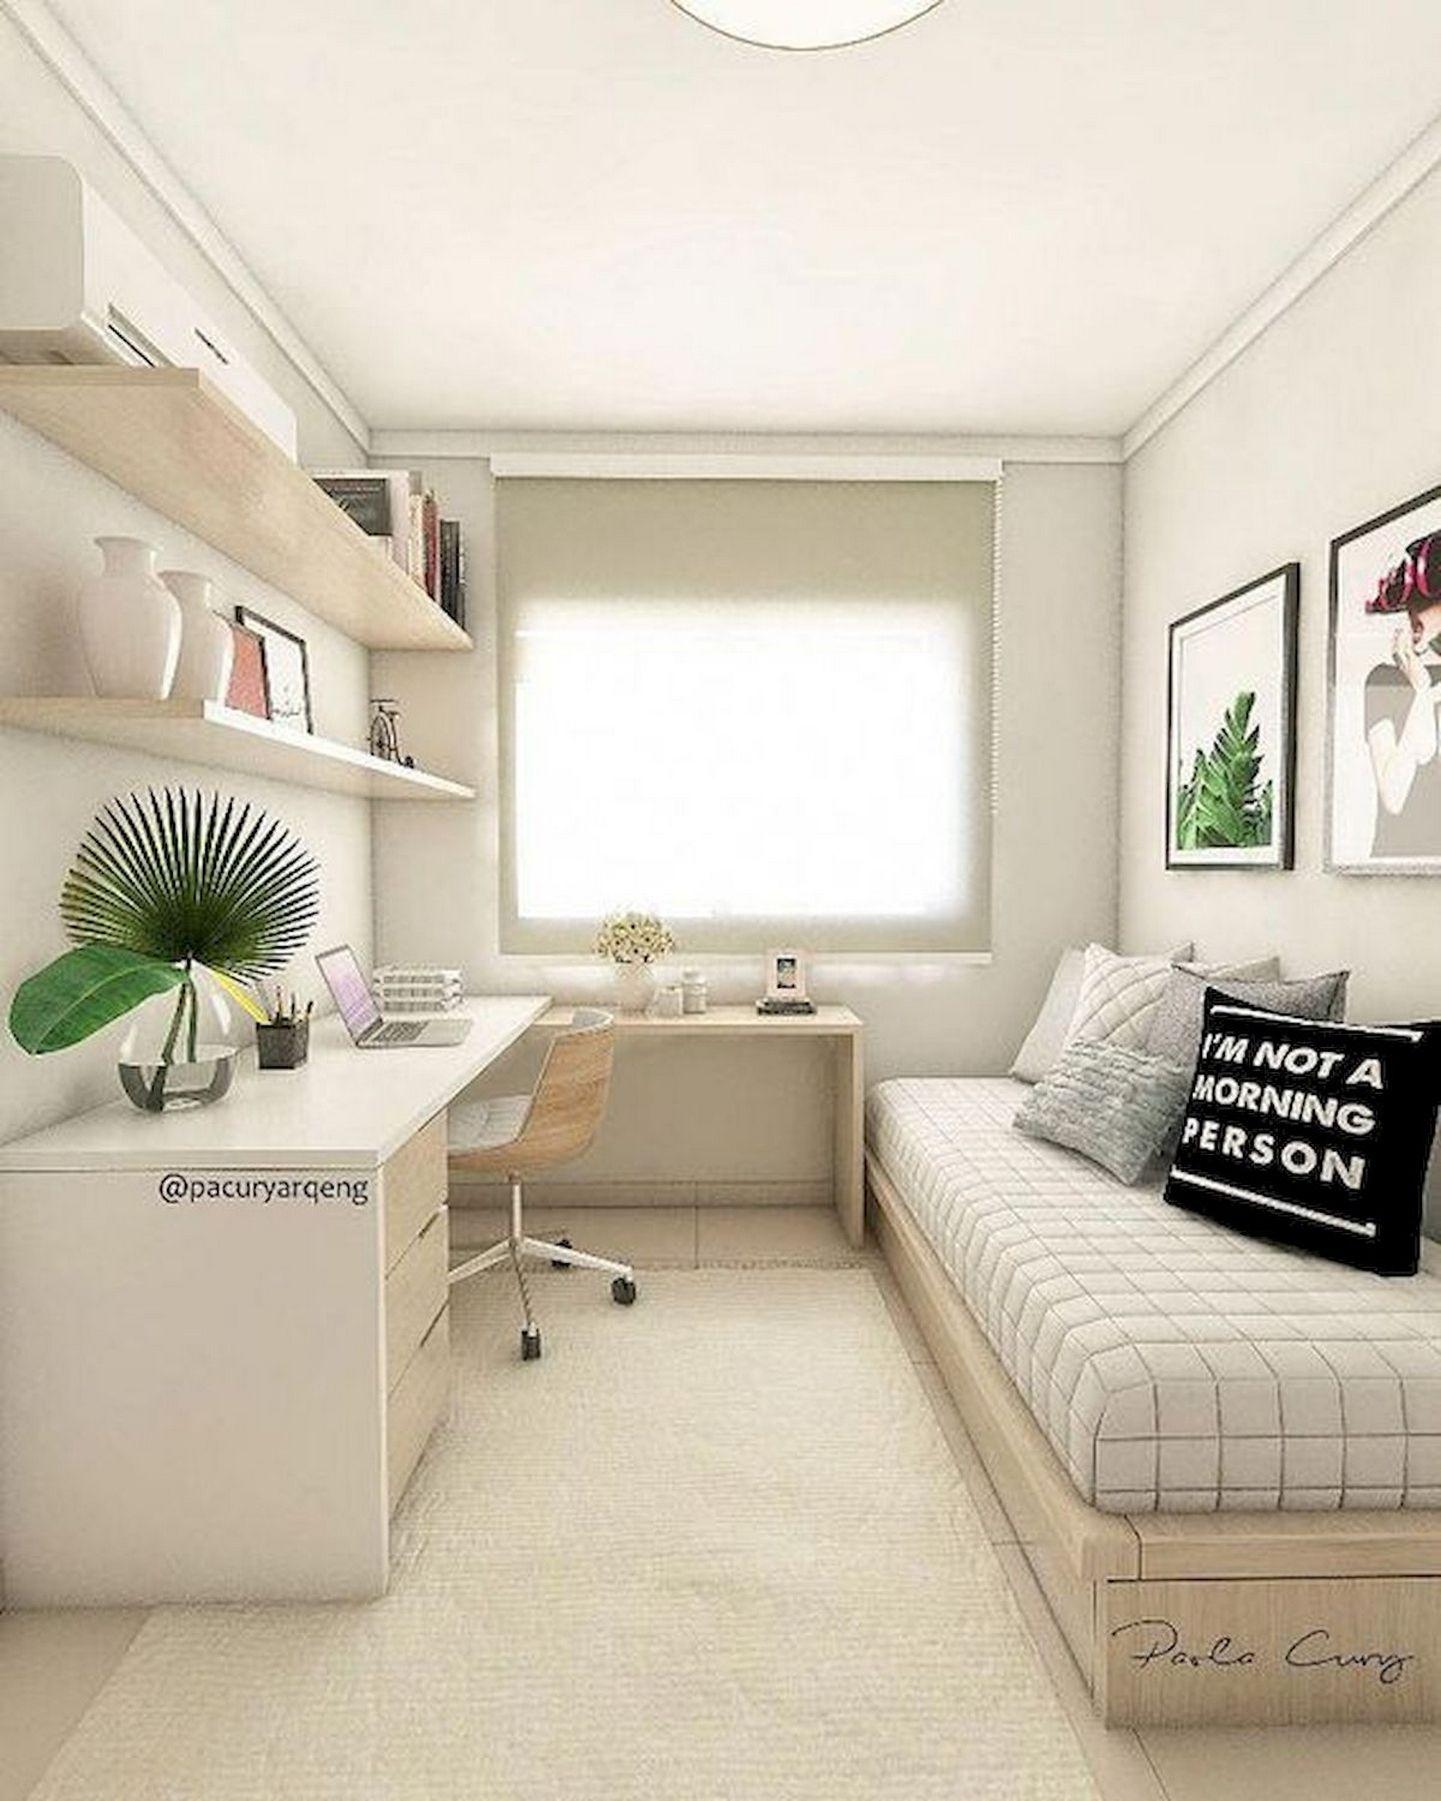 55 Model Bedroom Furniture Design Ideas For Small